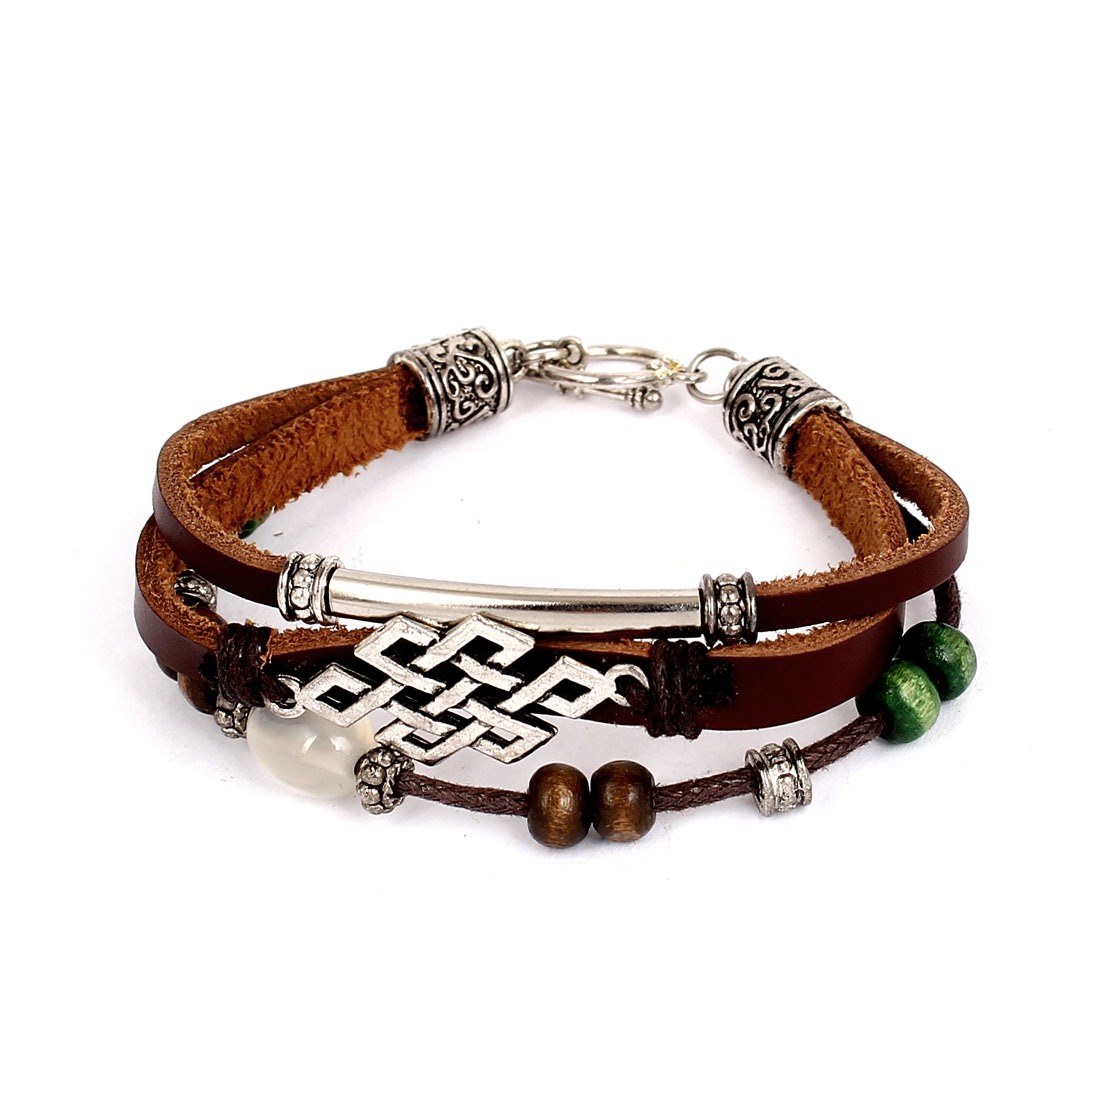 Women Retro Style Plastic Imitation Pearl Decor Interlocking Faux Leather Wrist Bracelet